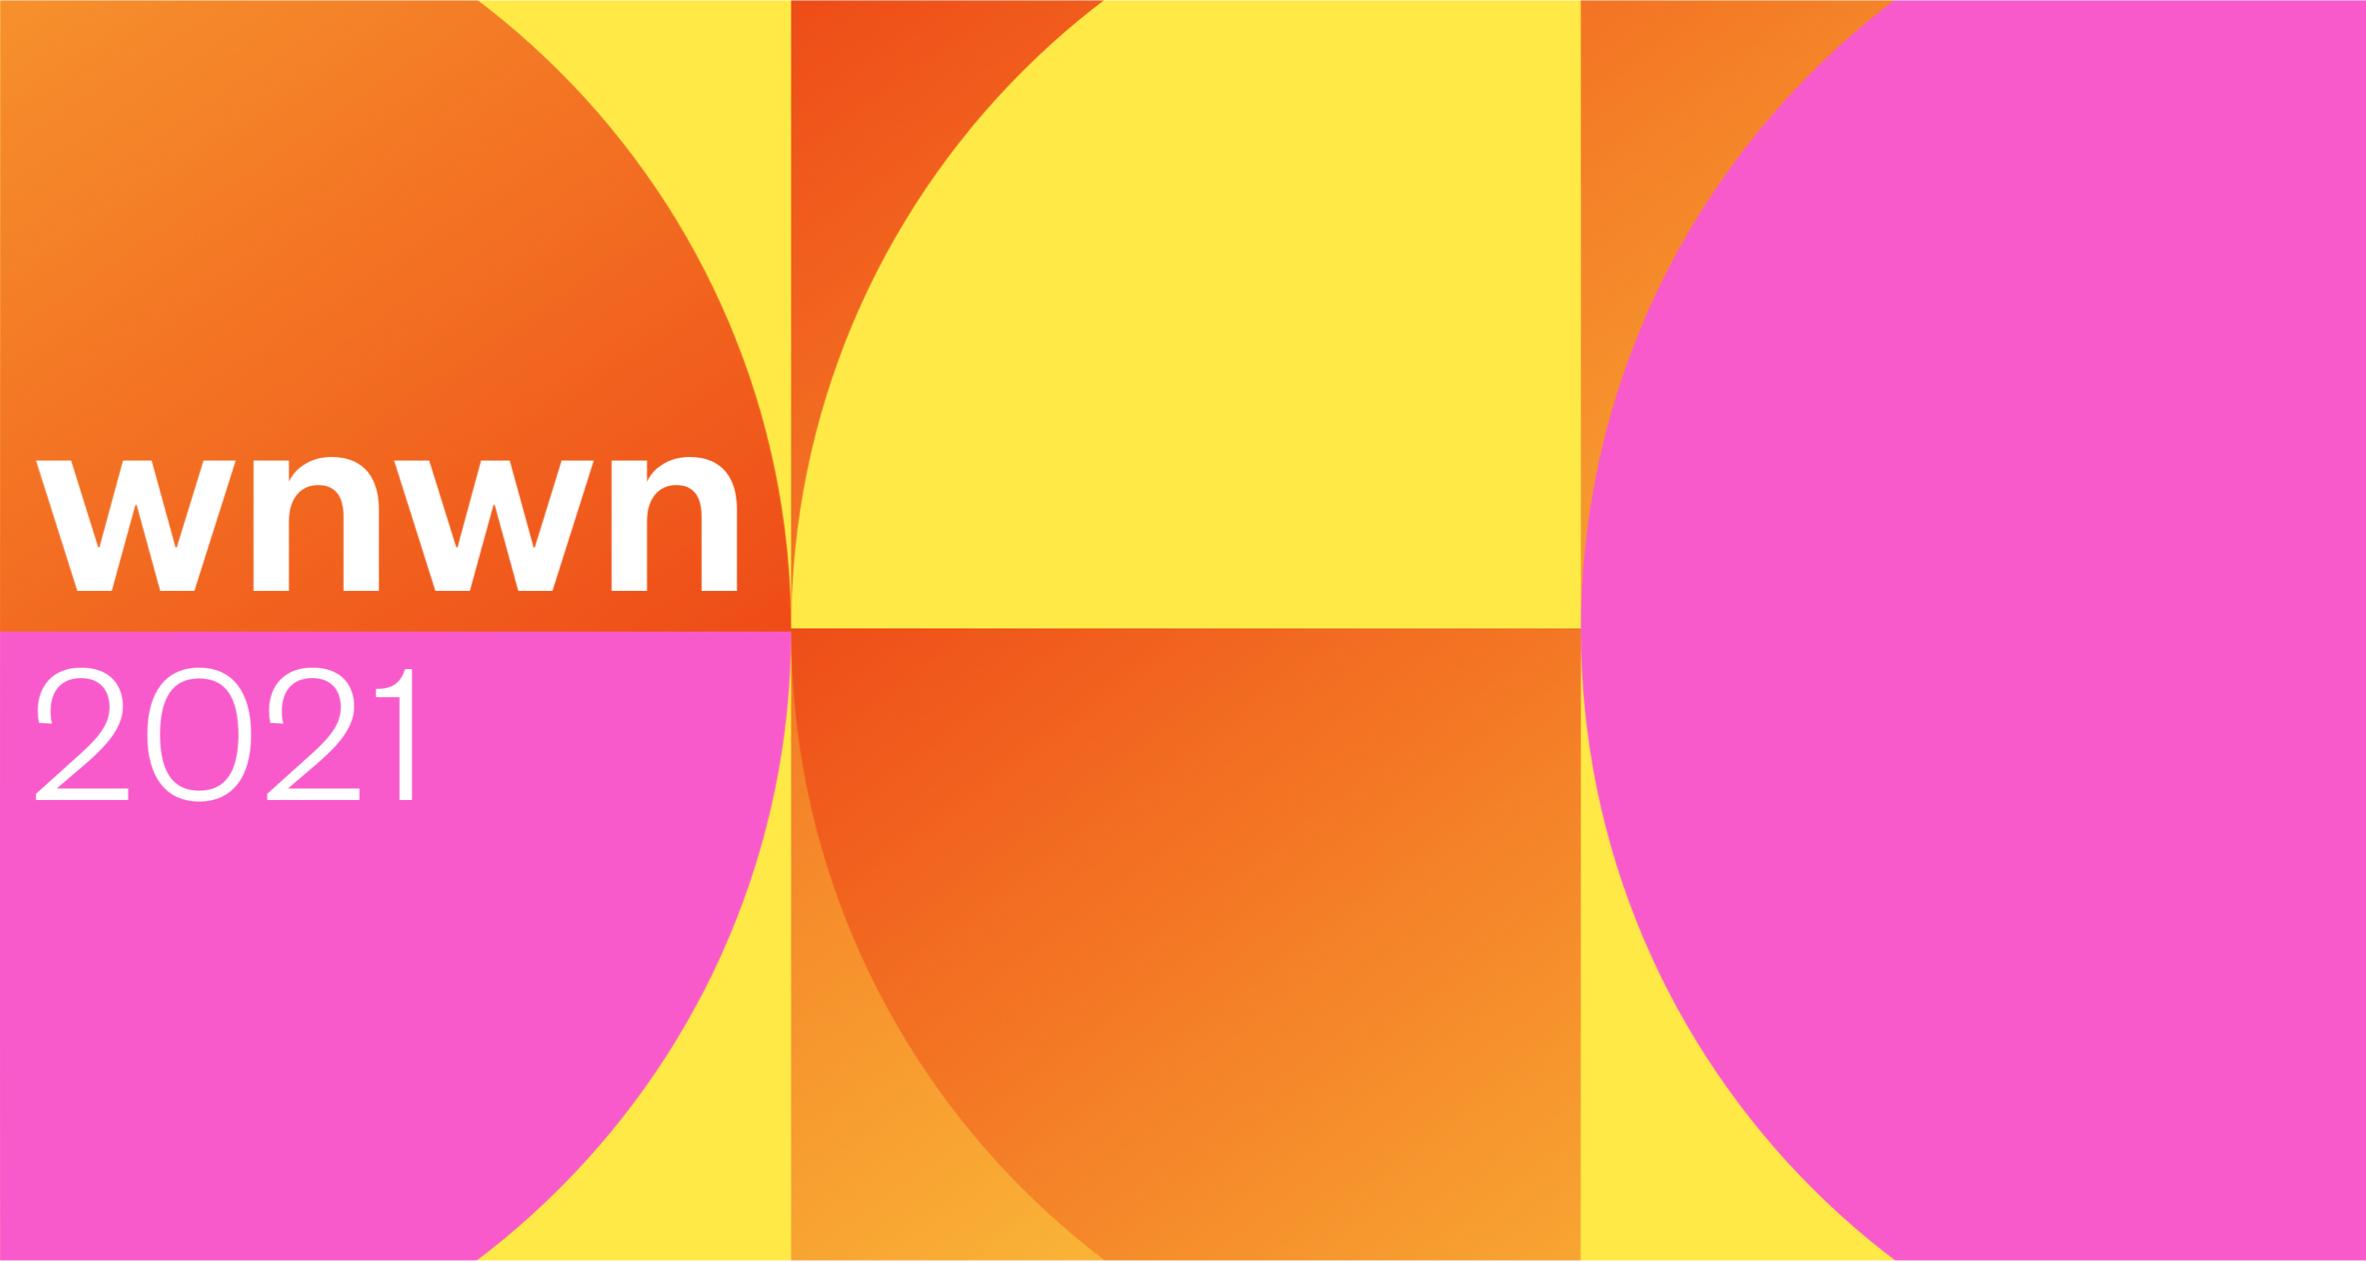 NYDC-wnwn2021-Takeover-Desktop